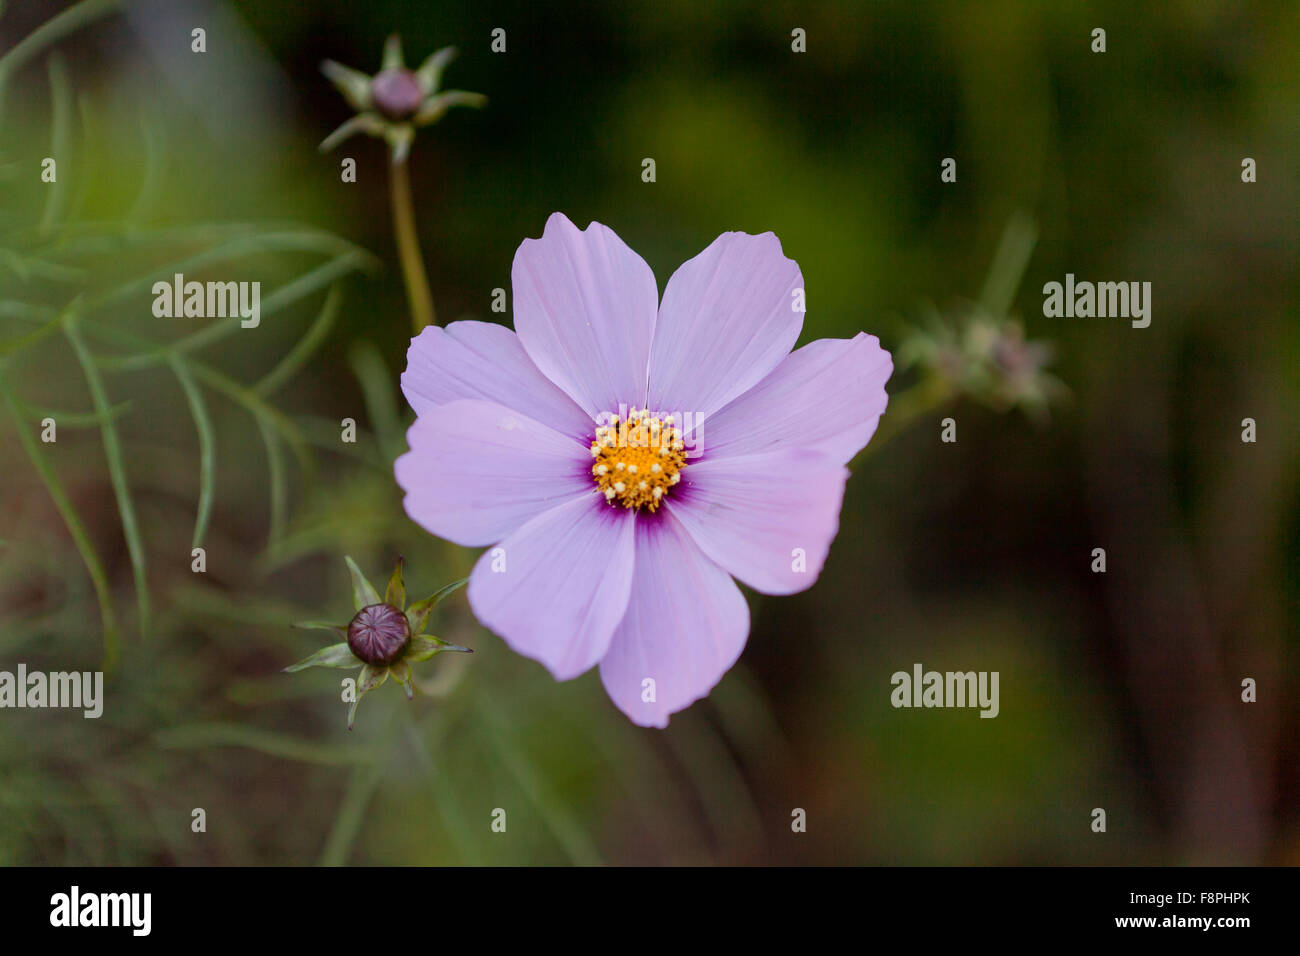 Cosmos flower - Stock Image